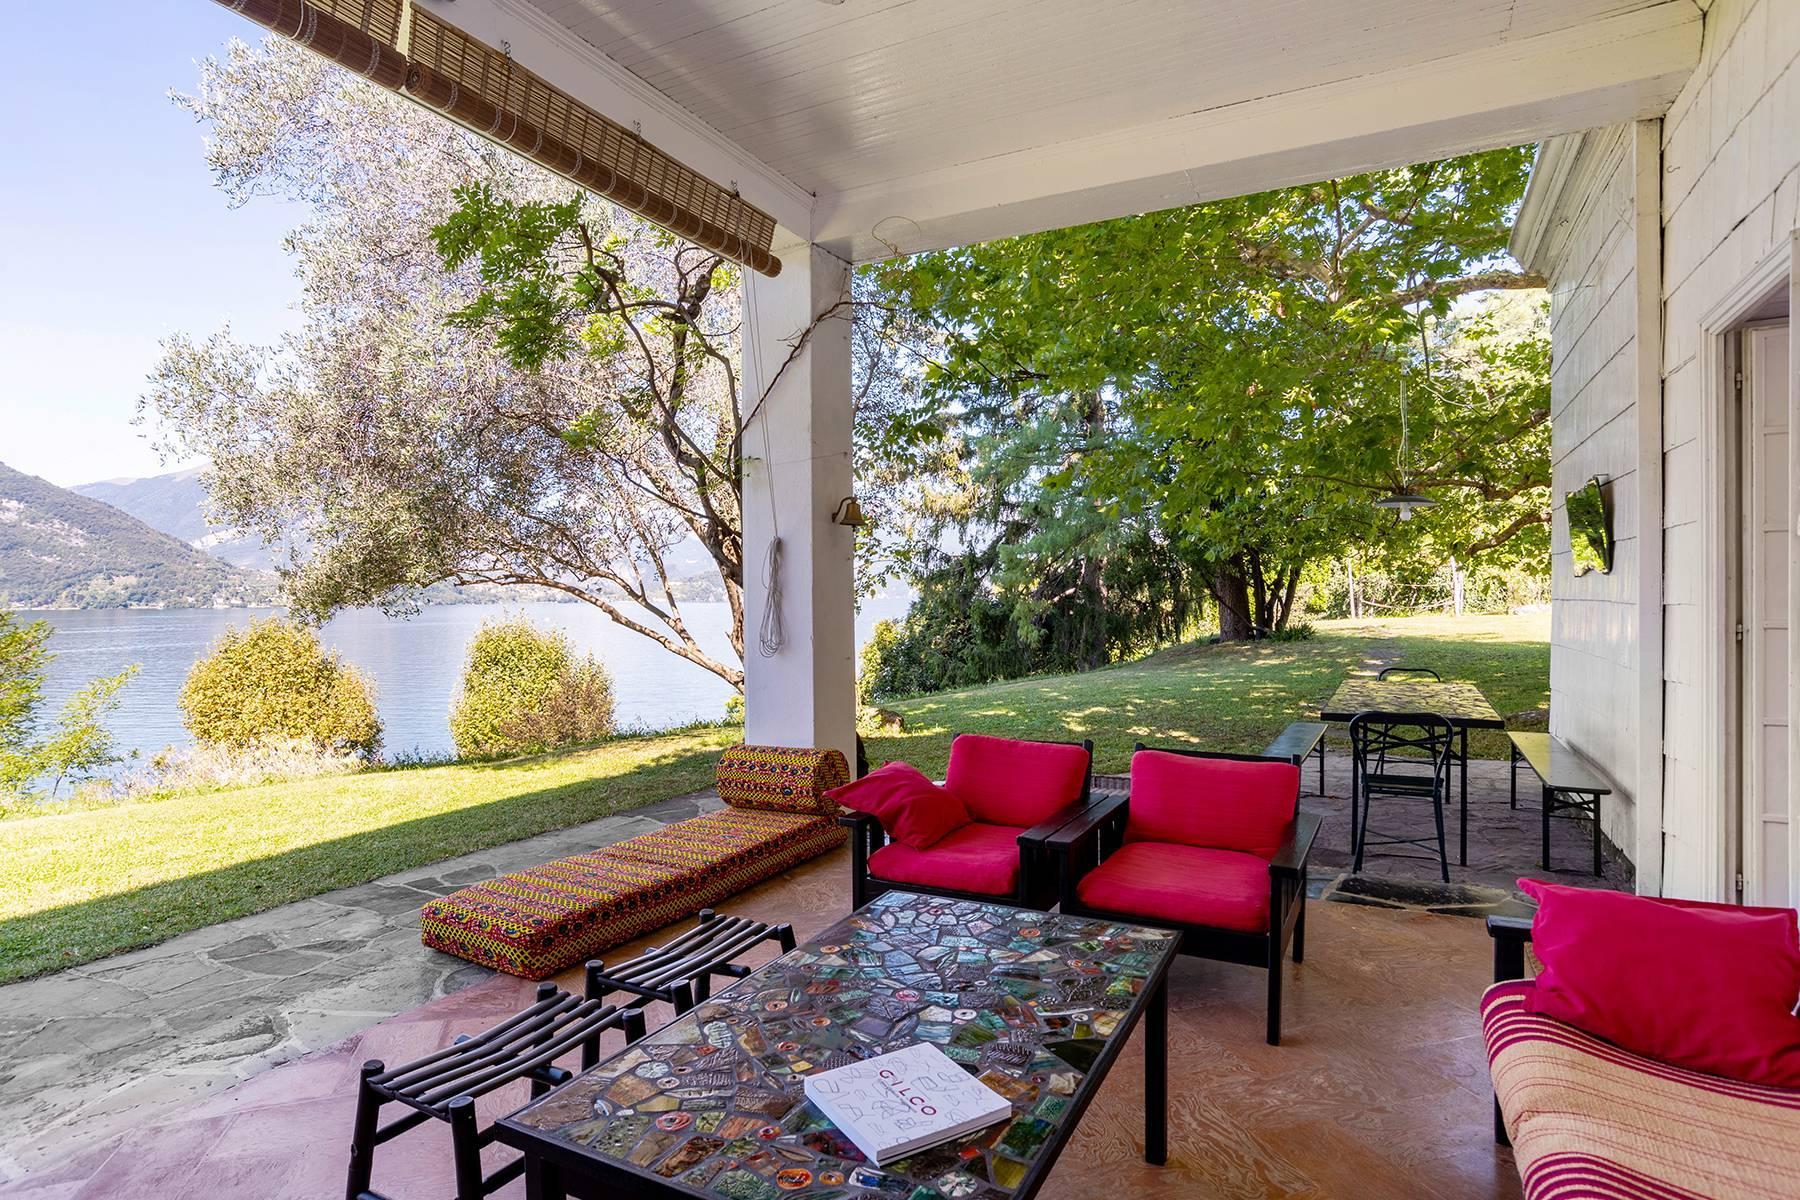 Splendida villa d'epoca con vista lago mozzafiato - 9